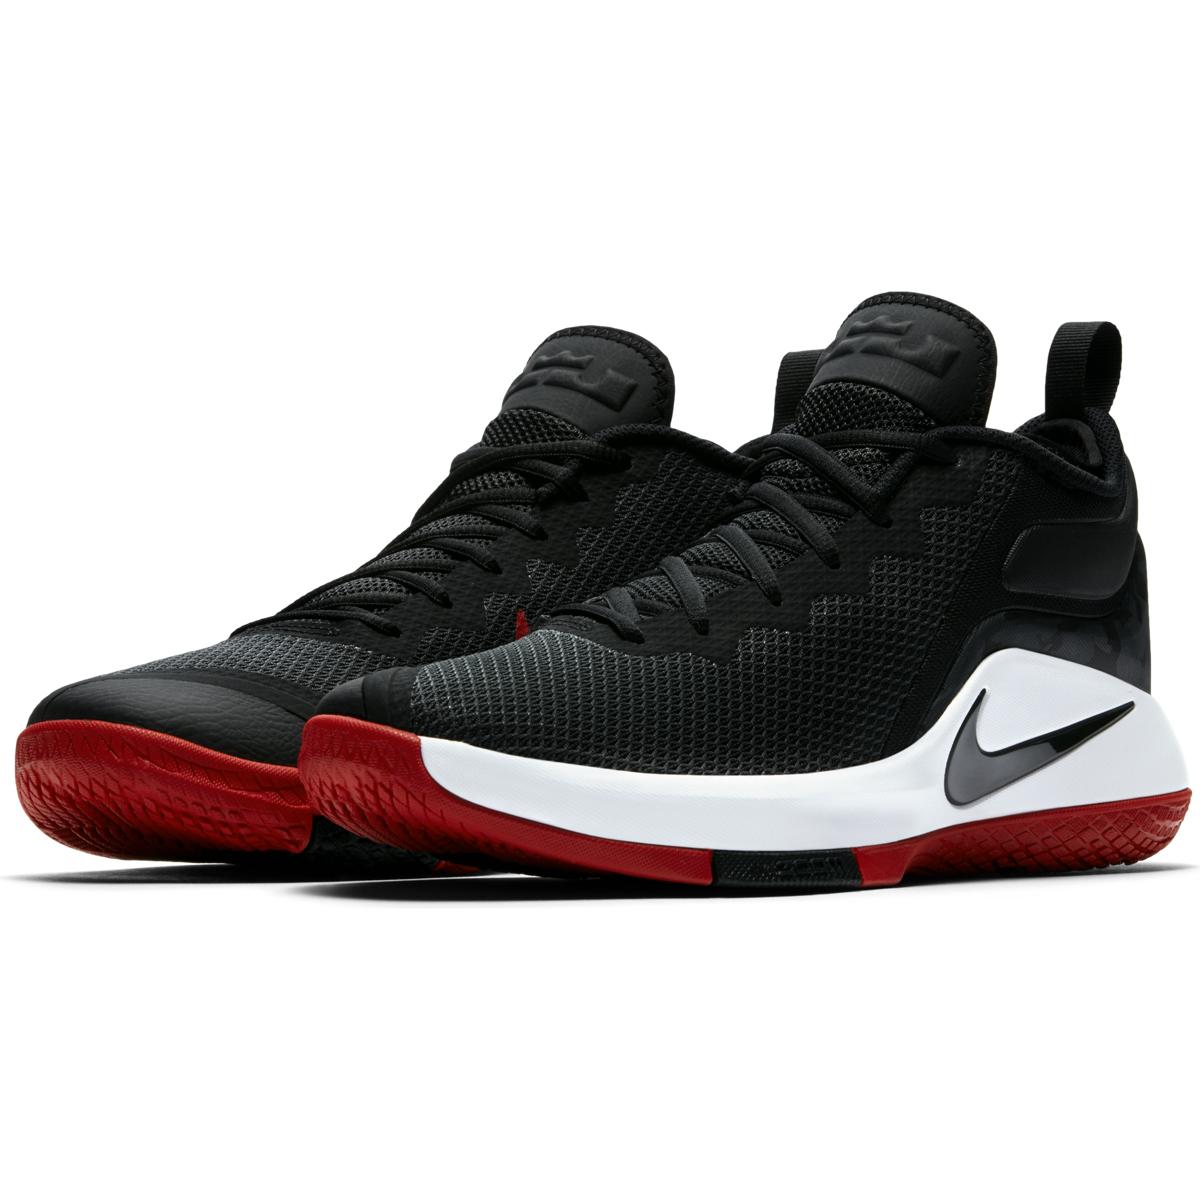 reputable site f6548 bea0b ... Shoes Black Purple Nike Lebron Witness II . ...